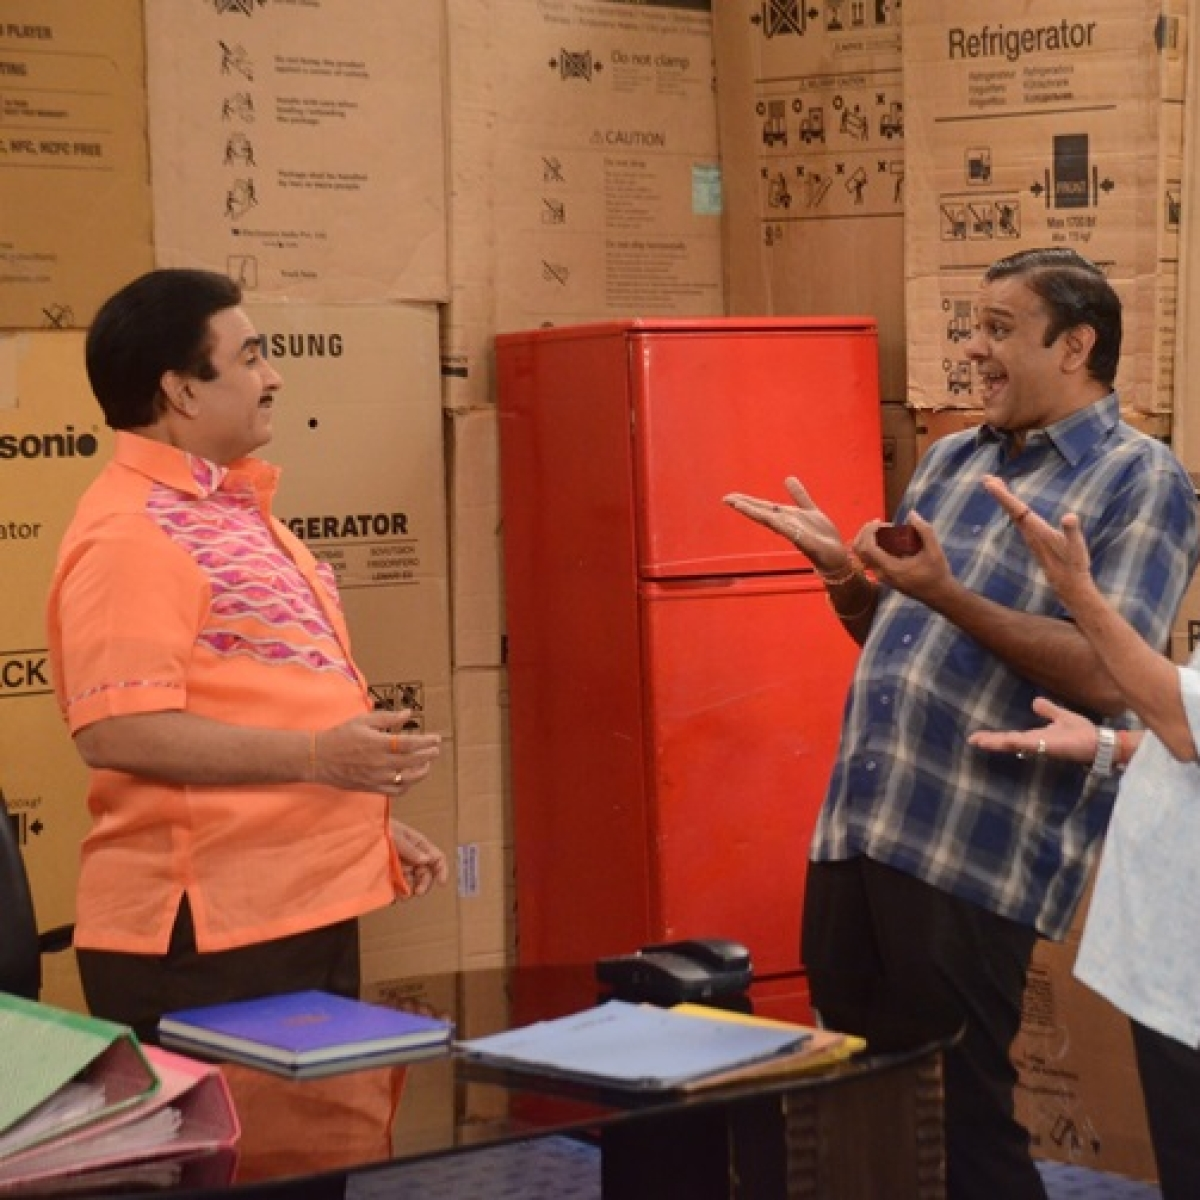 Jethaa Lal's fortunes turn with Chamatkari Angoothi on 'Tarak Mehta Ka Ooltah Chashma'